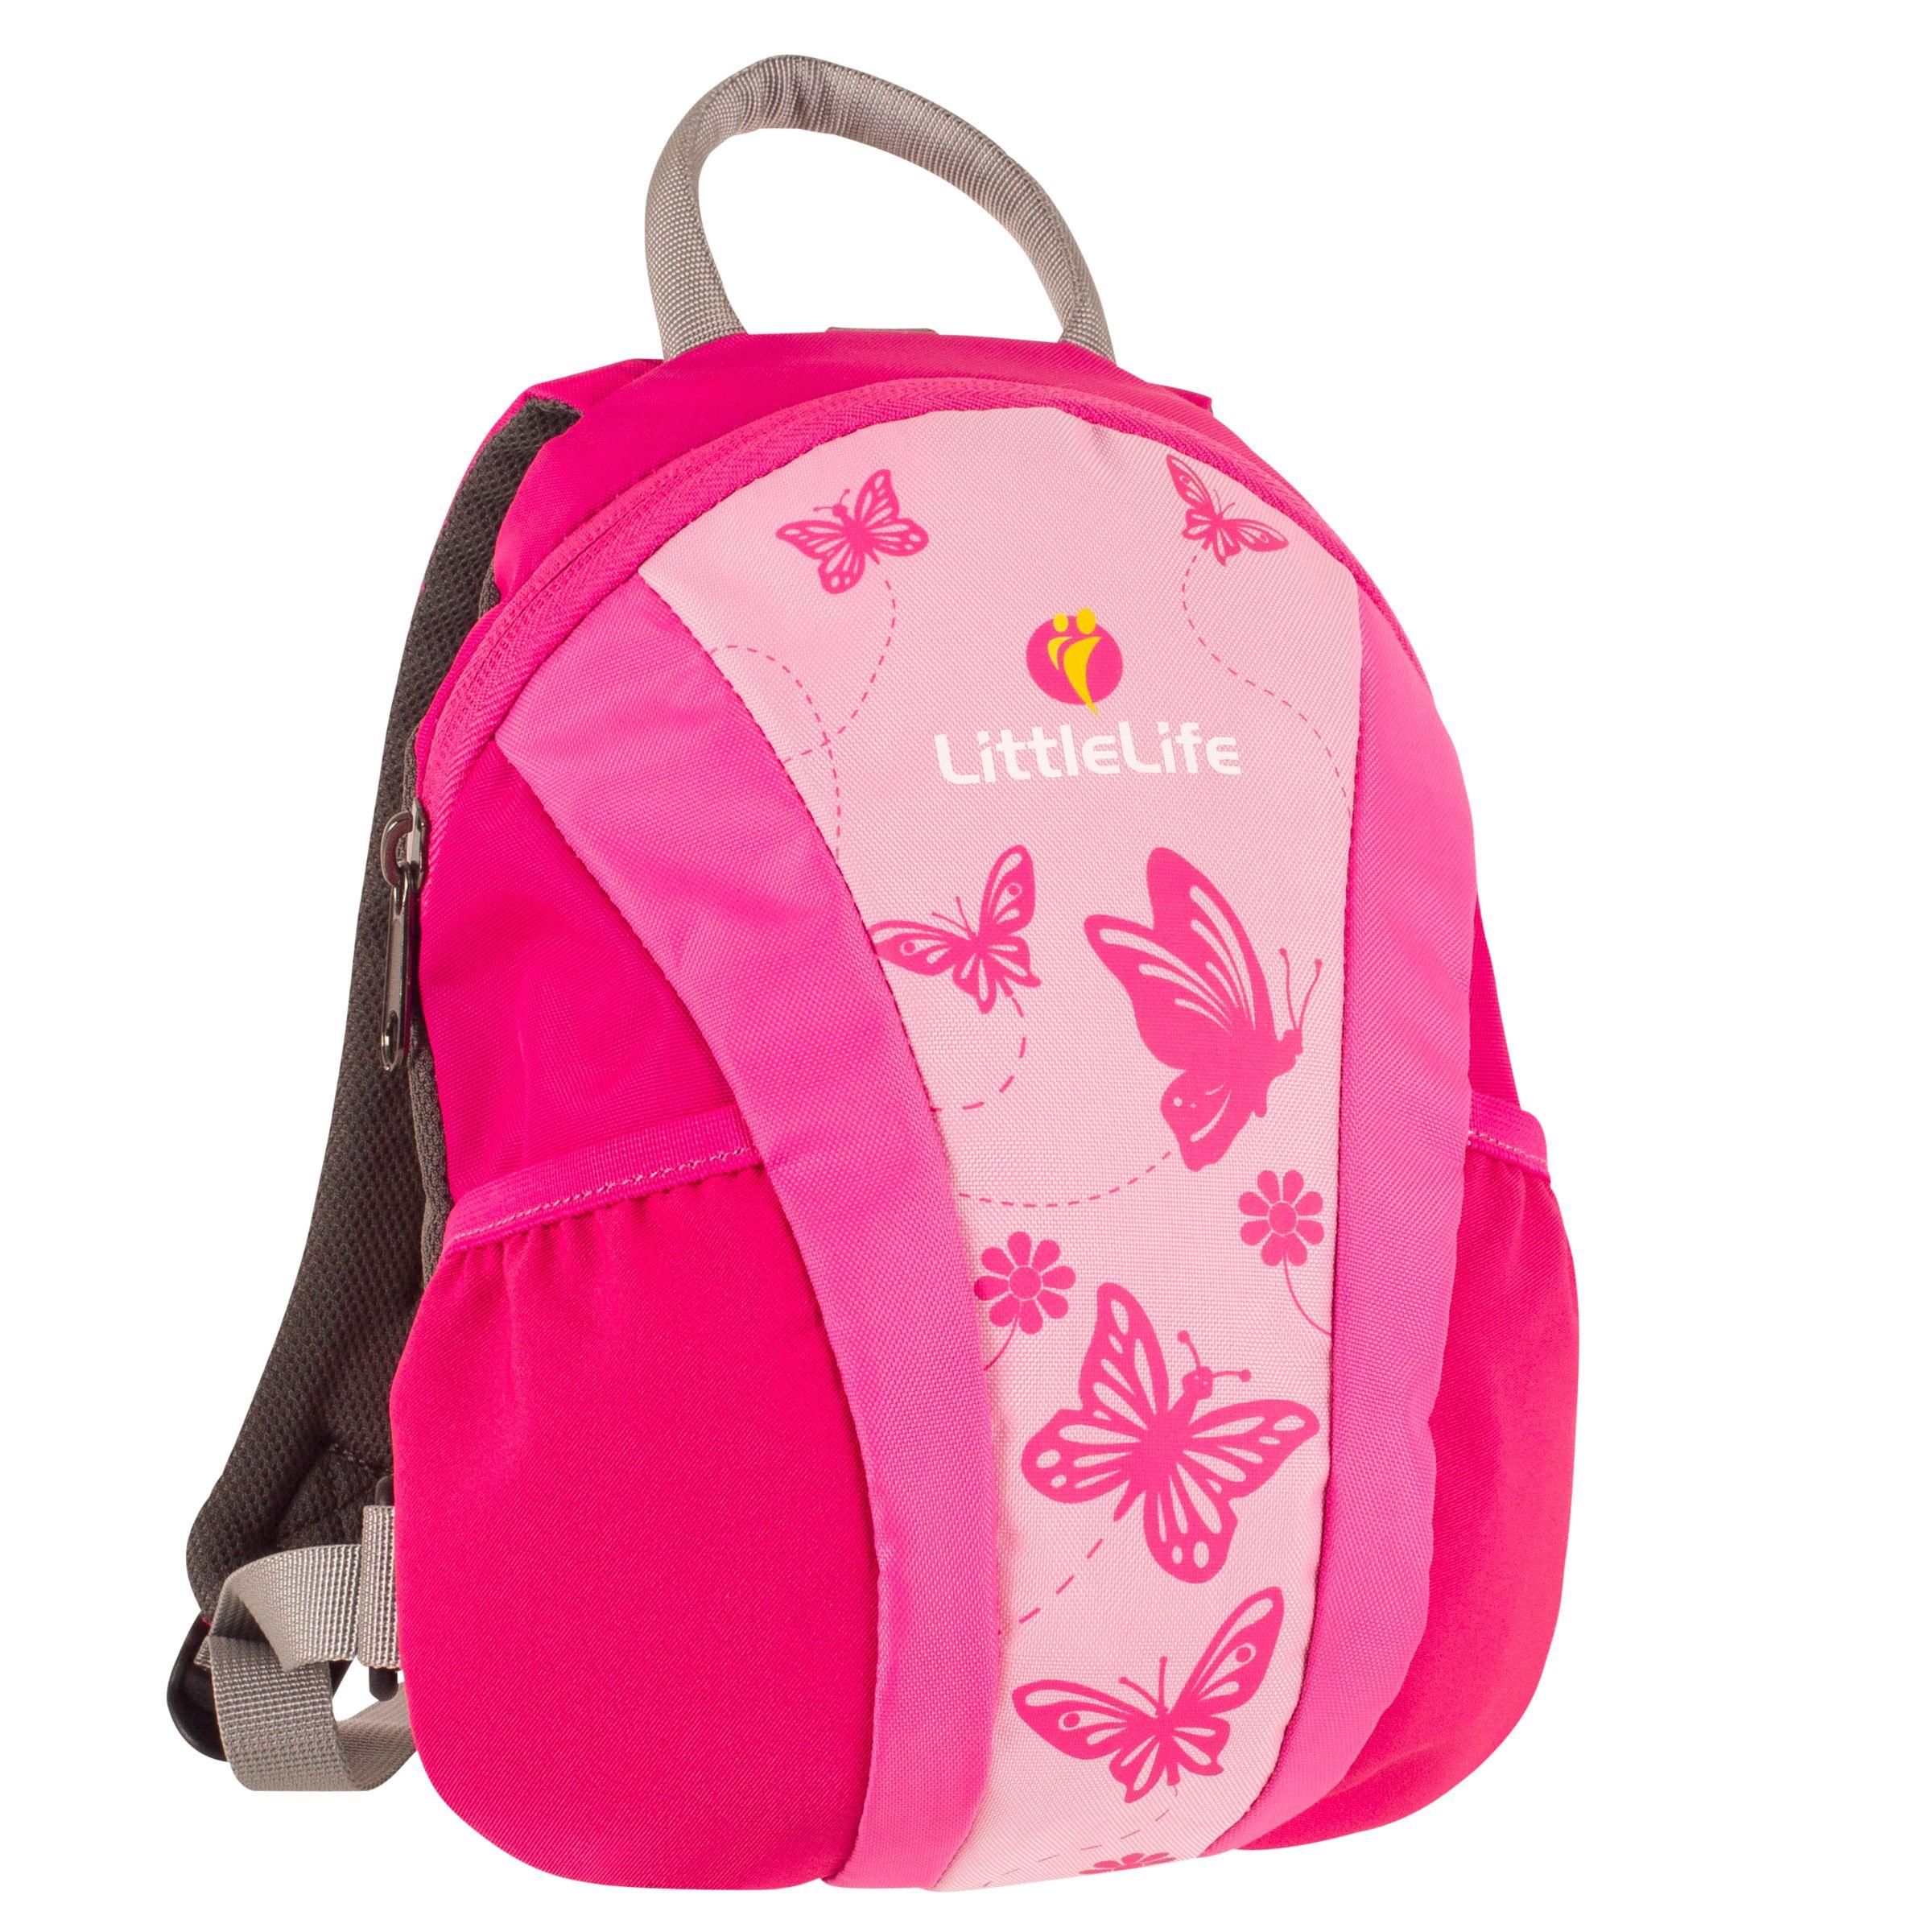 Littlelife LittleLife Runabout Toddler Backpack, Pink